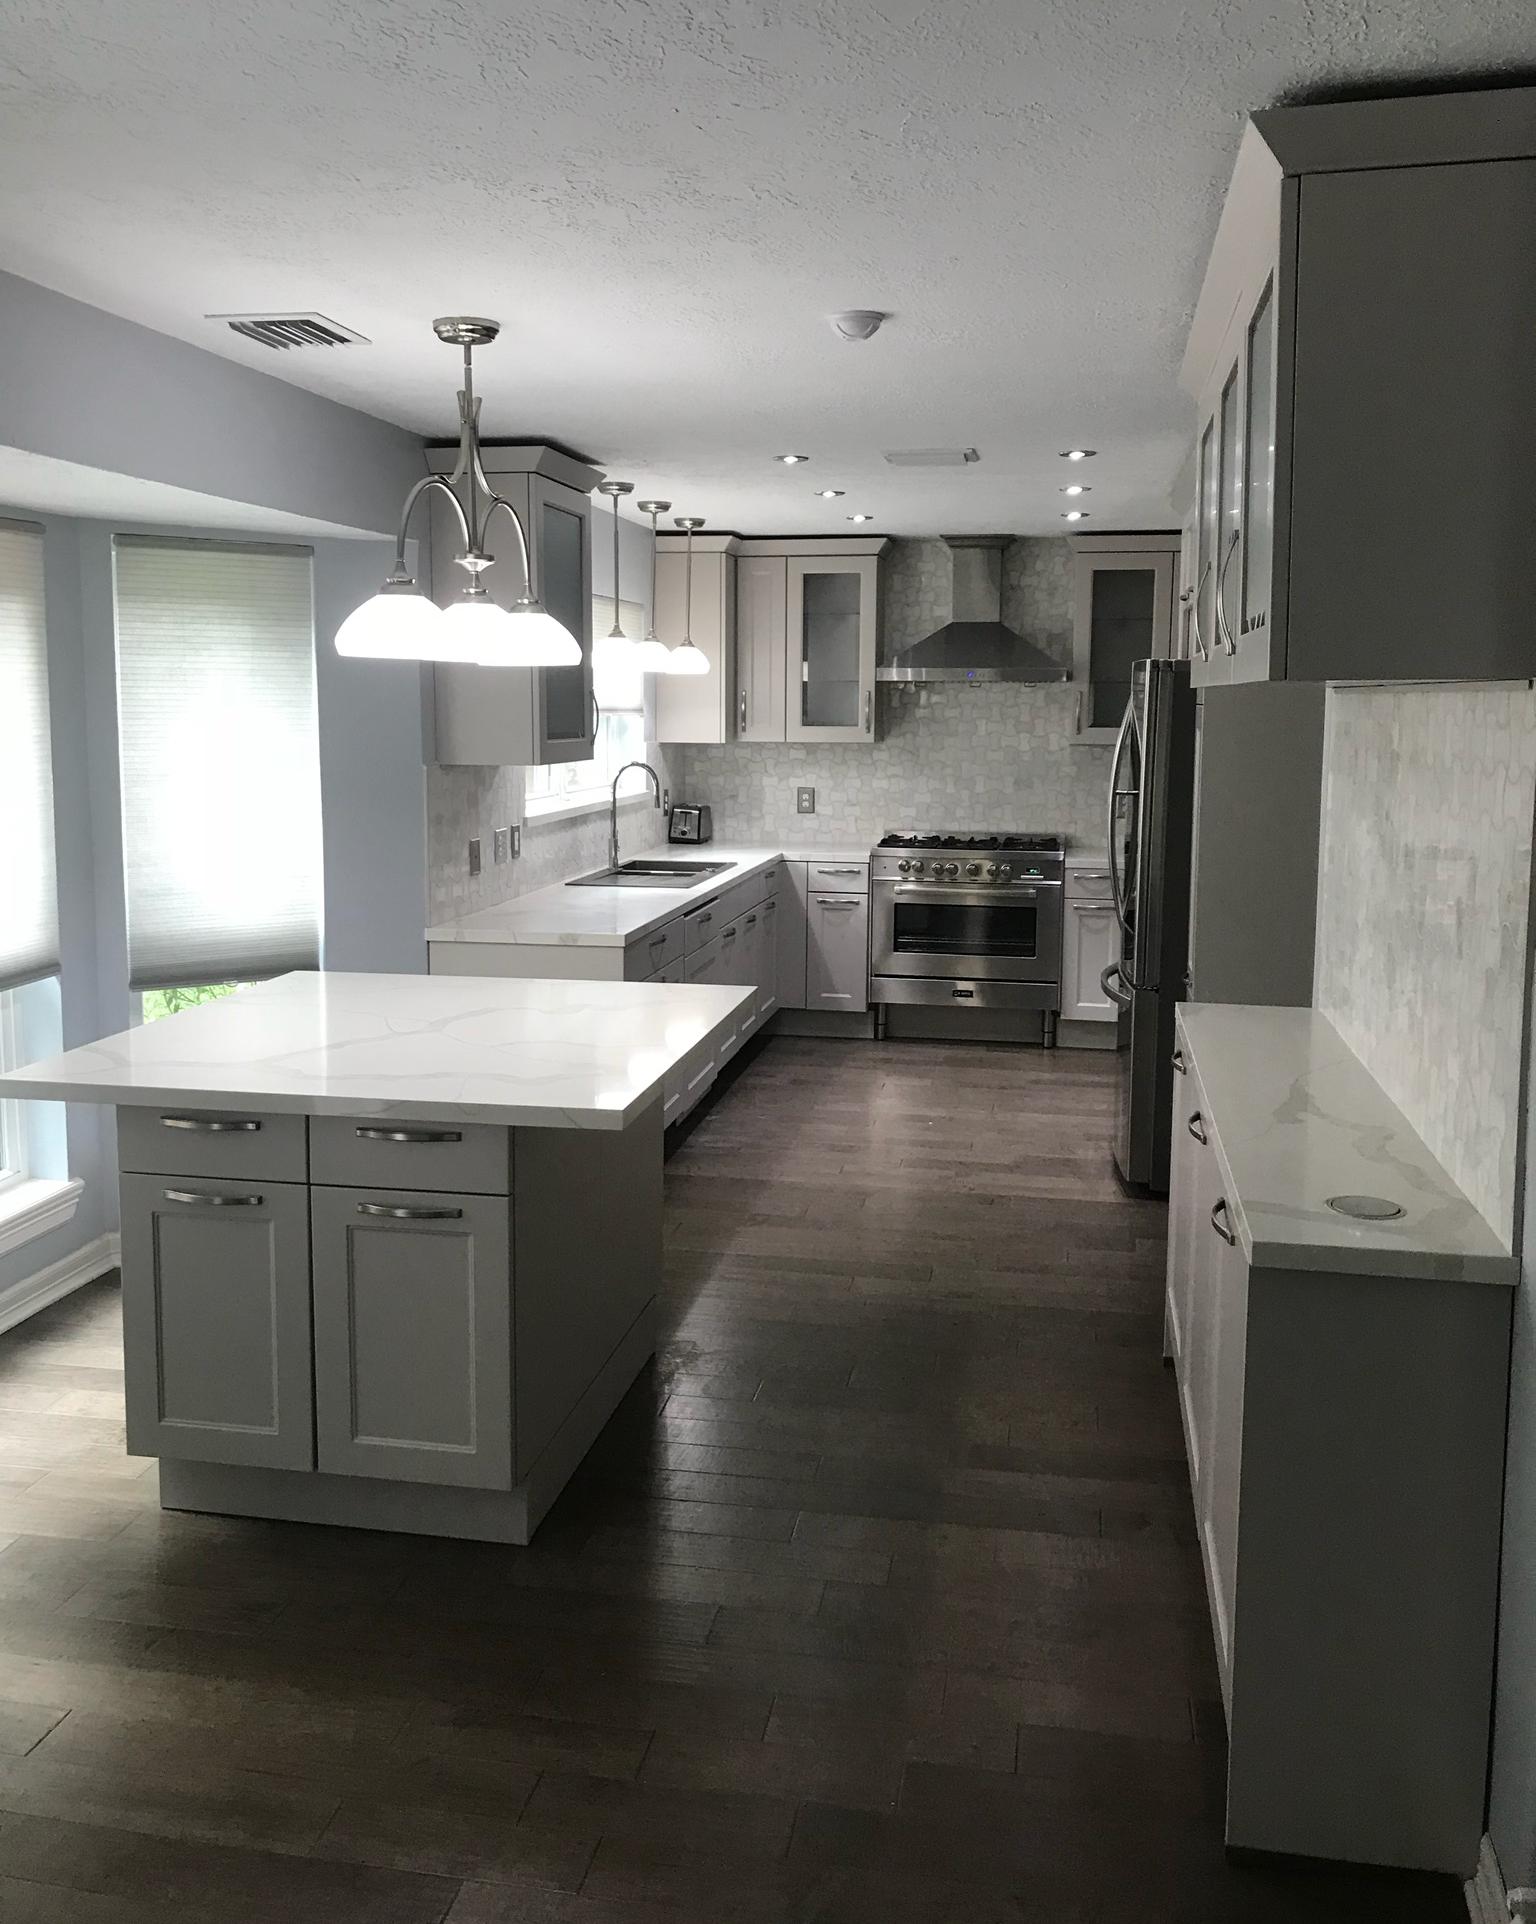 German kitchen remodeling